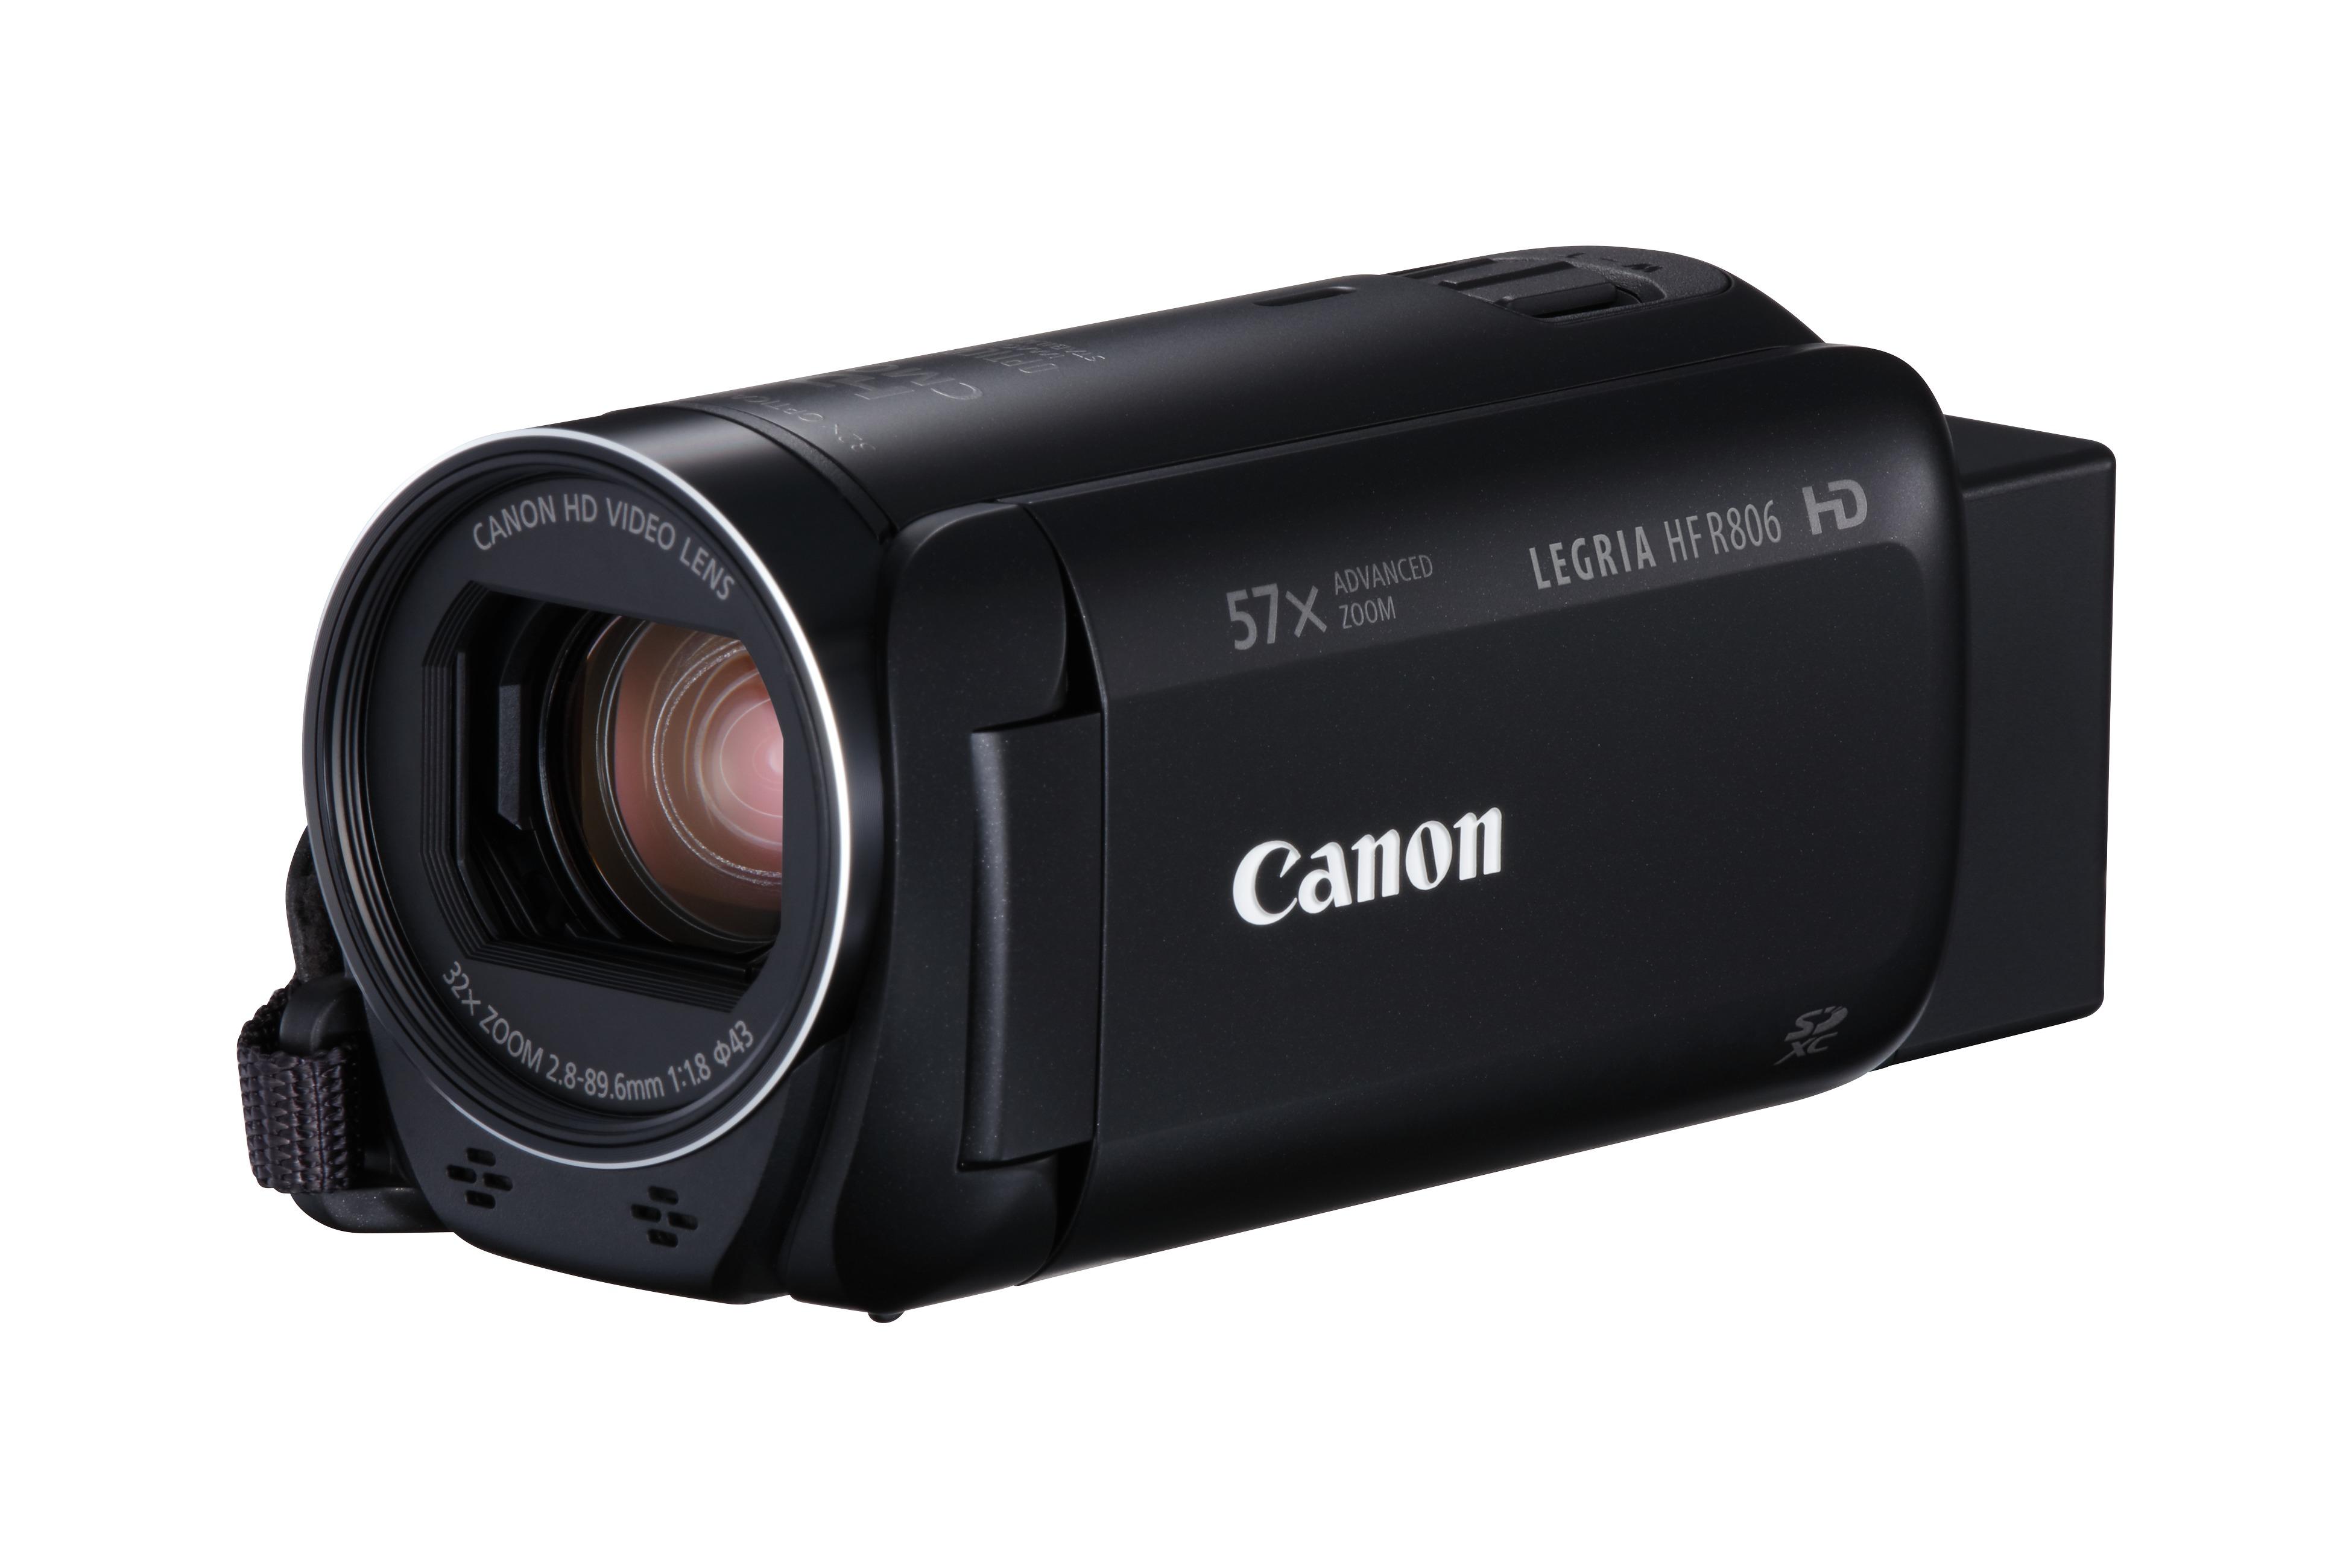 LEGRIA HF R806 VIDEOCáMARA MANUAL 3.28MP CMOS FULL HD NEGRO